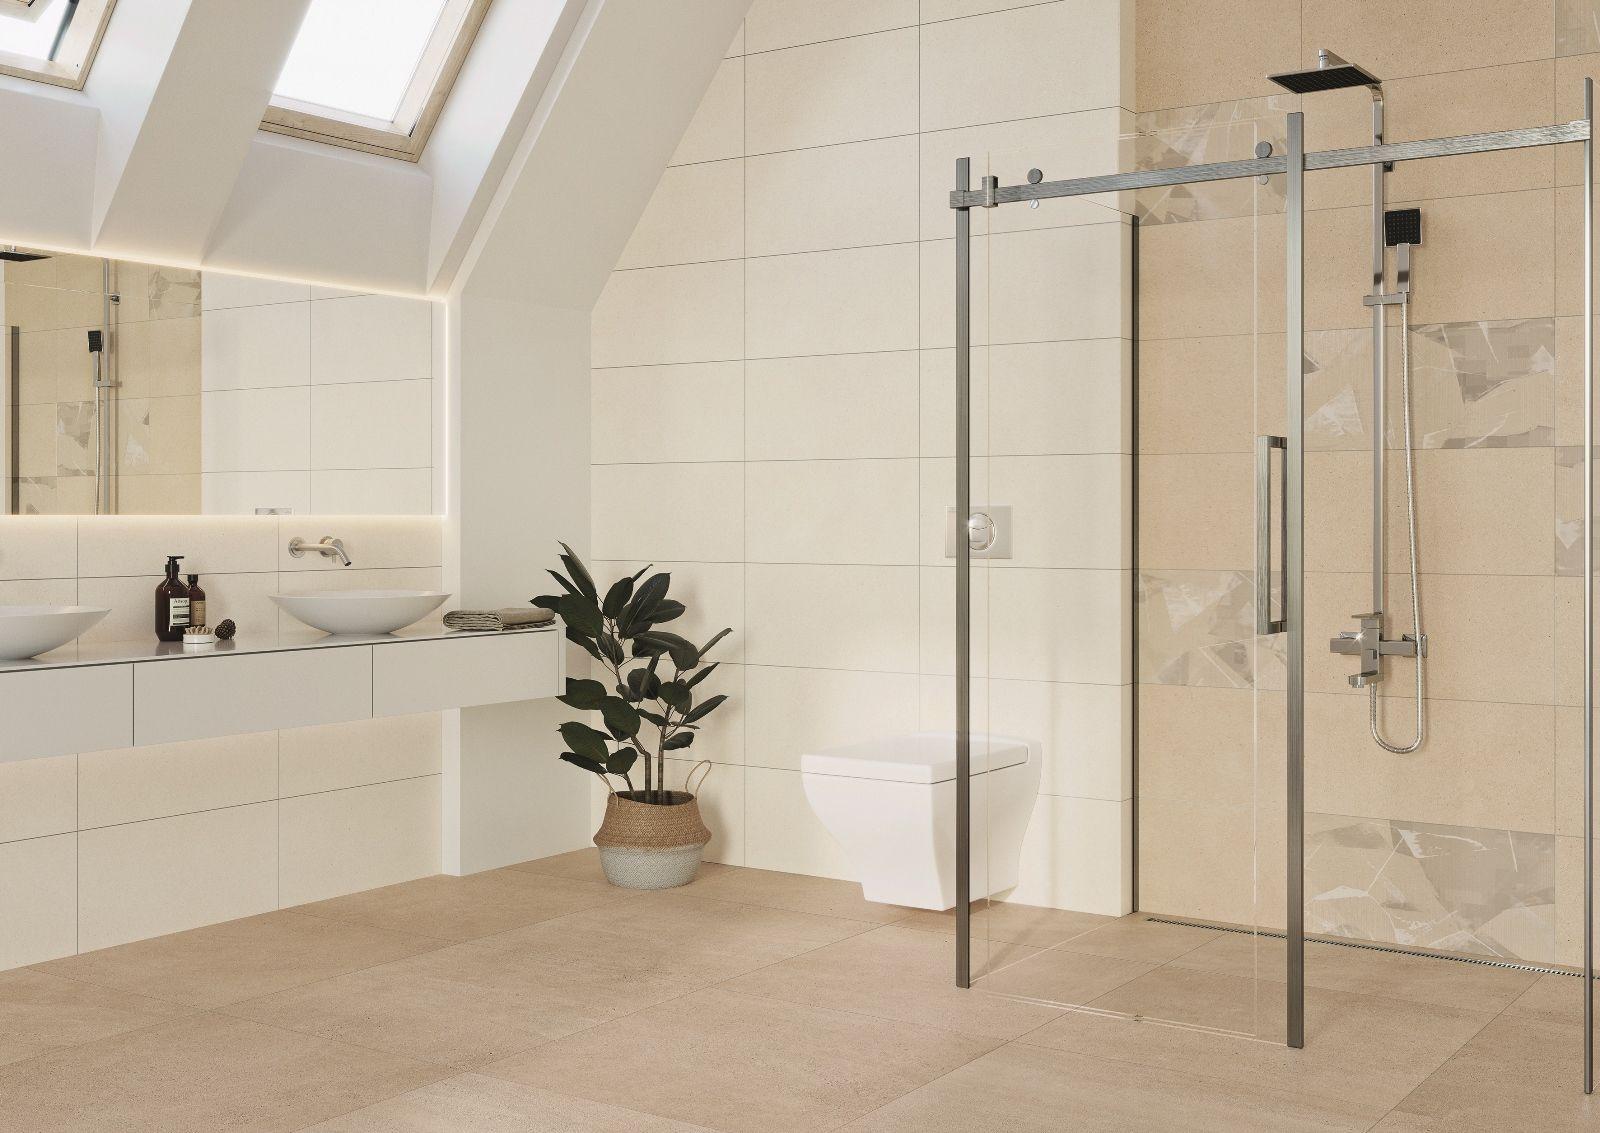 Steuler Paperstone Wandfliese Sand Rektifiziert 30x60cm Badezimmer Badezimmer Fliesen Beige Badezimmer Fliesen